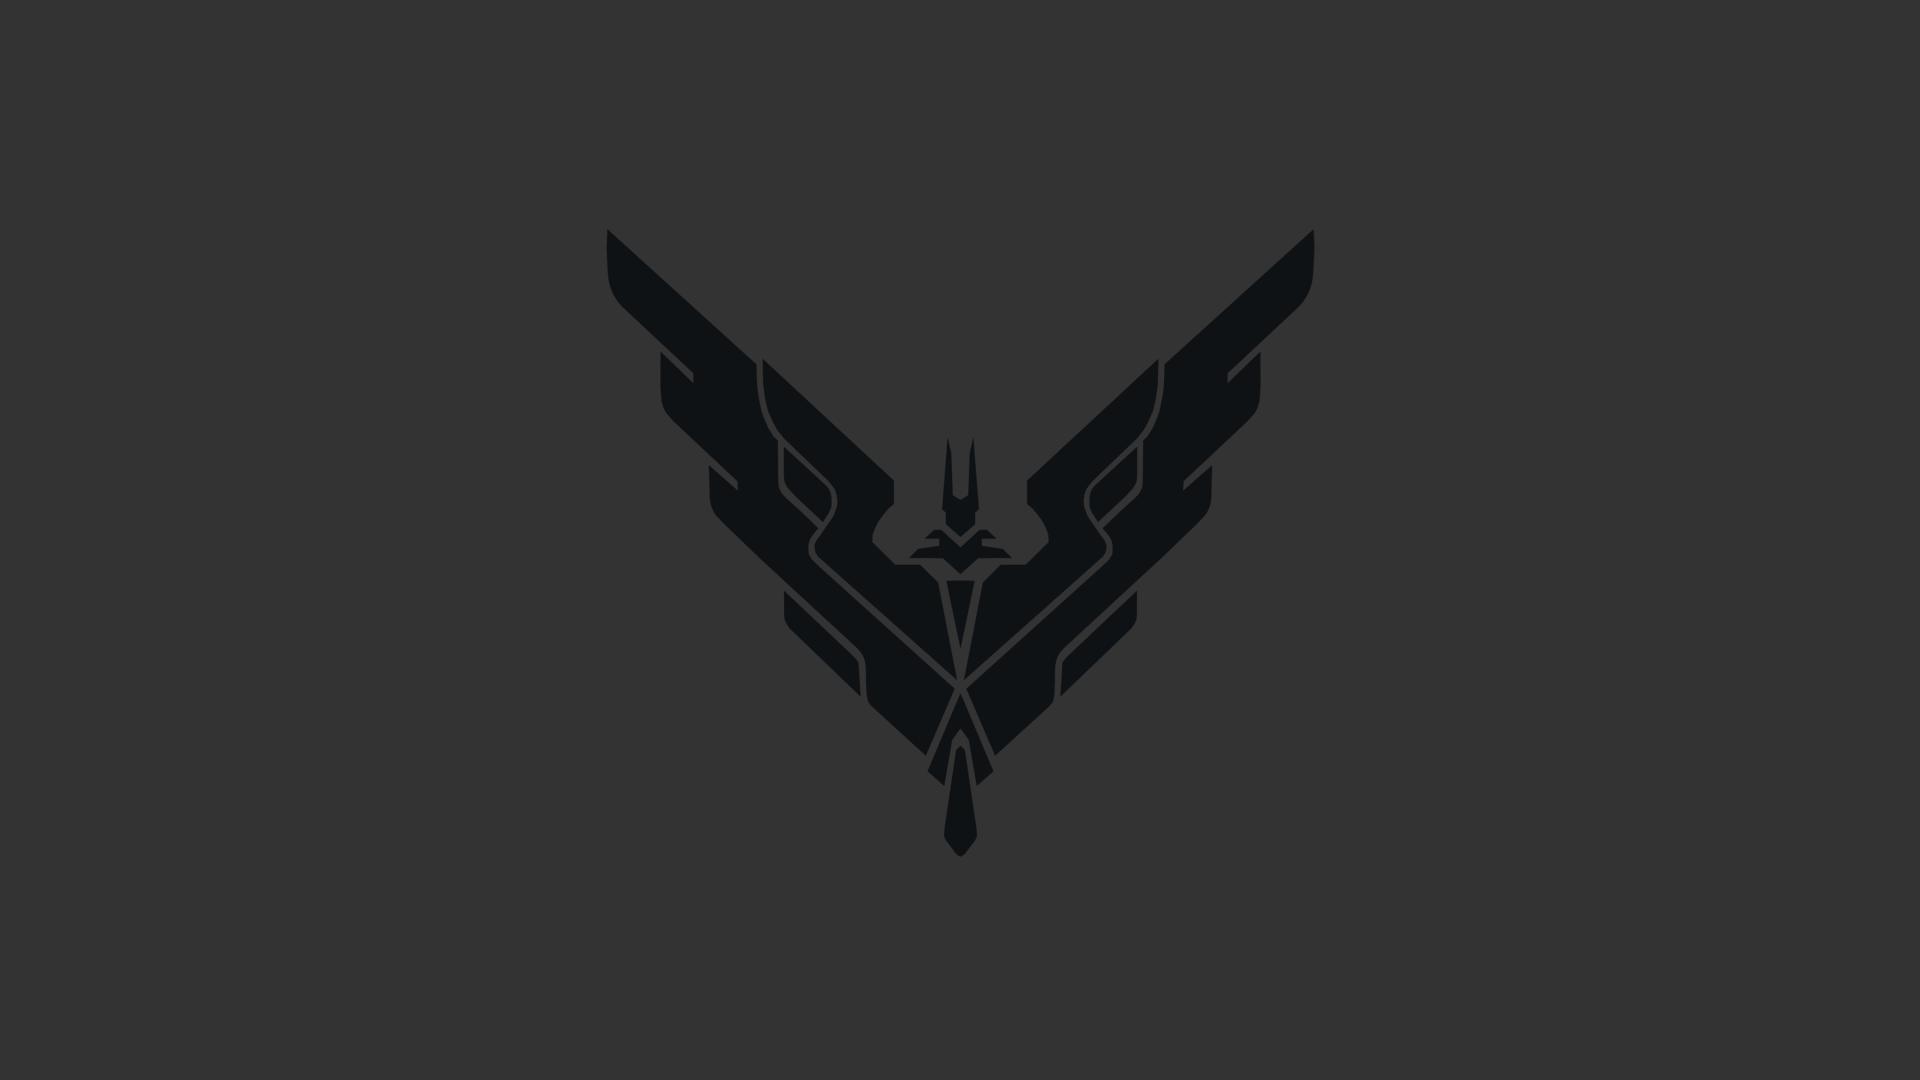 Elite: Dangerous, Logo wallpaper thumb